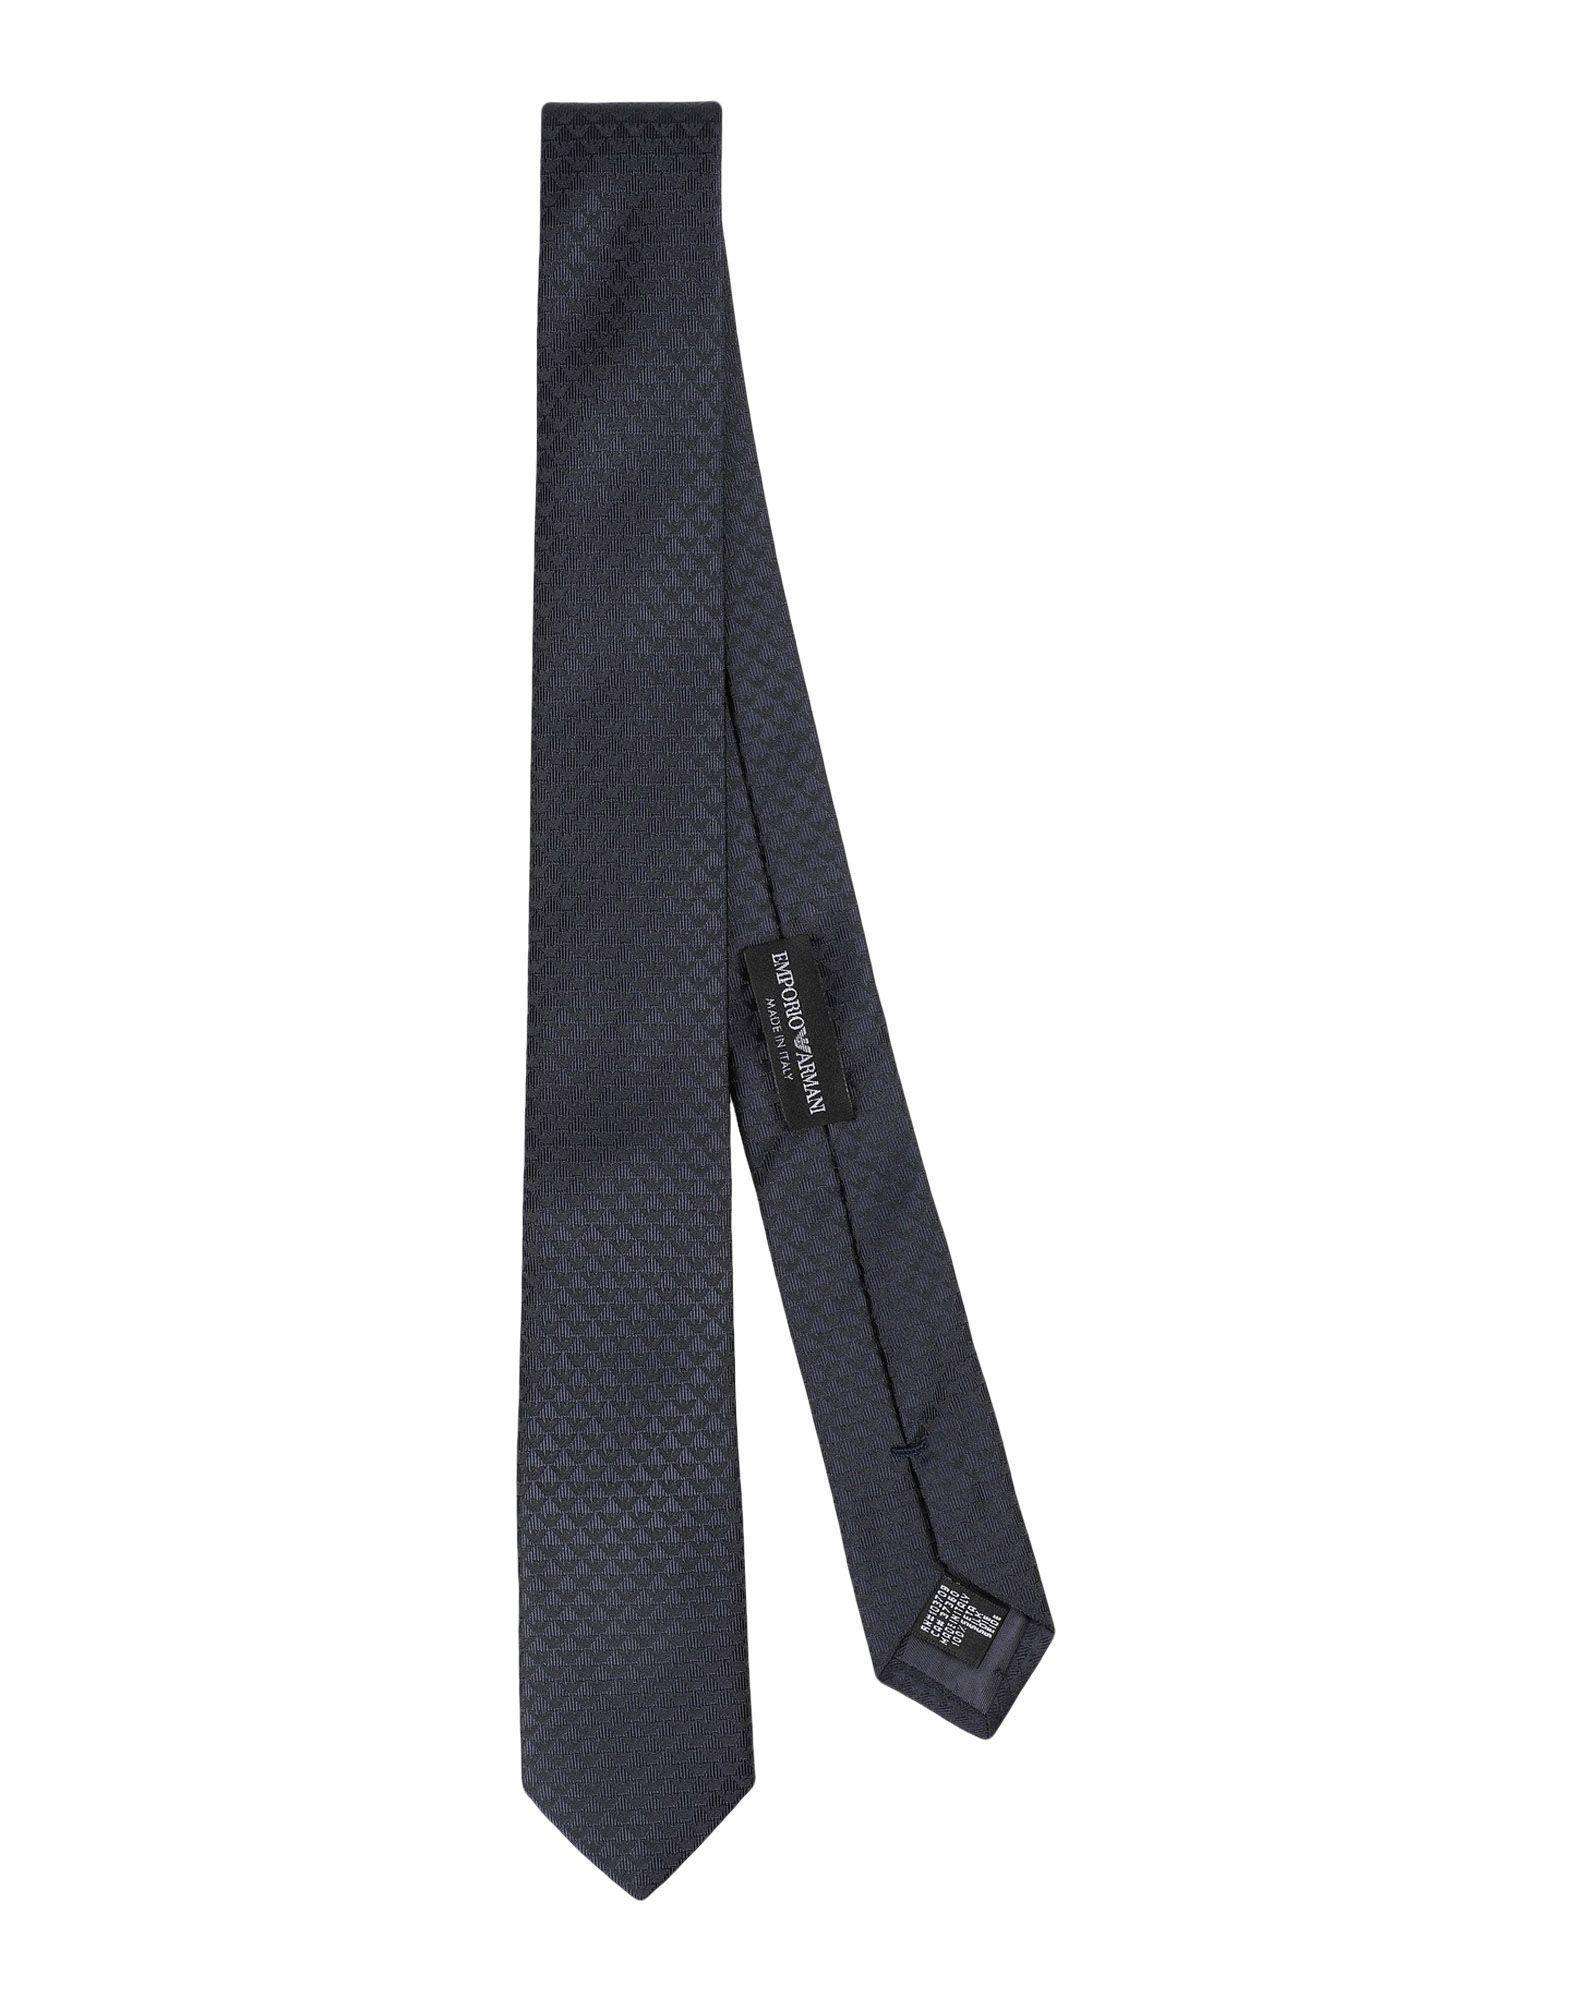 Emporio Armani Tie In Dark Blue